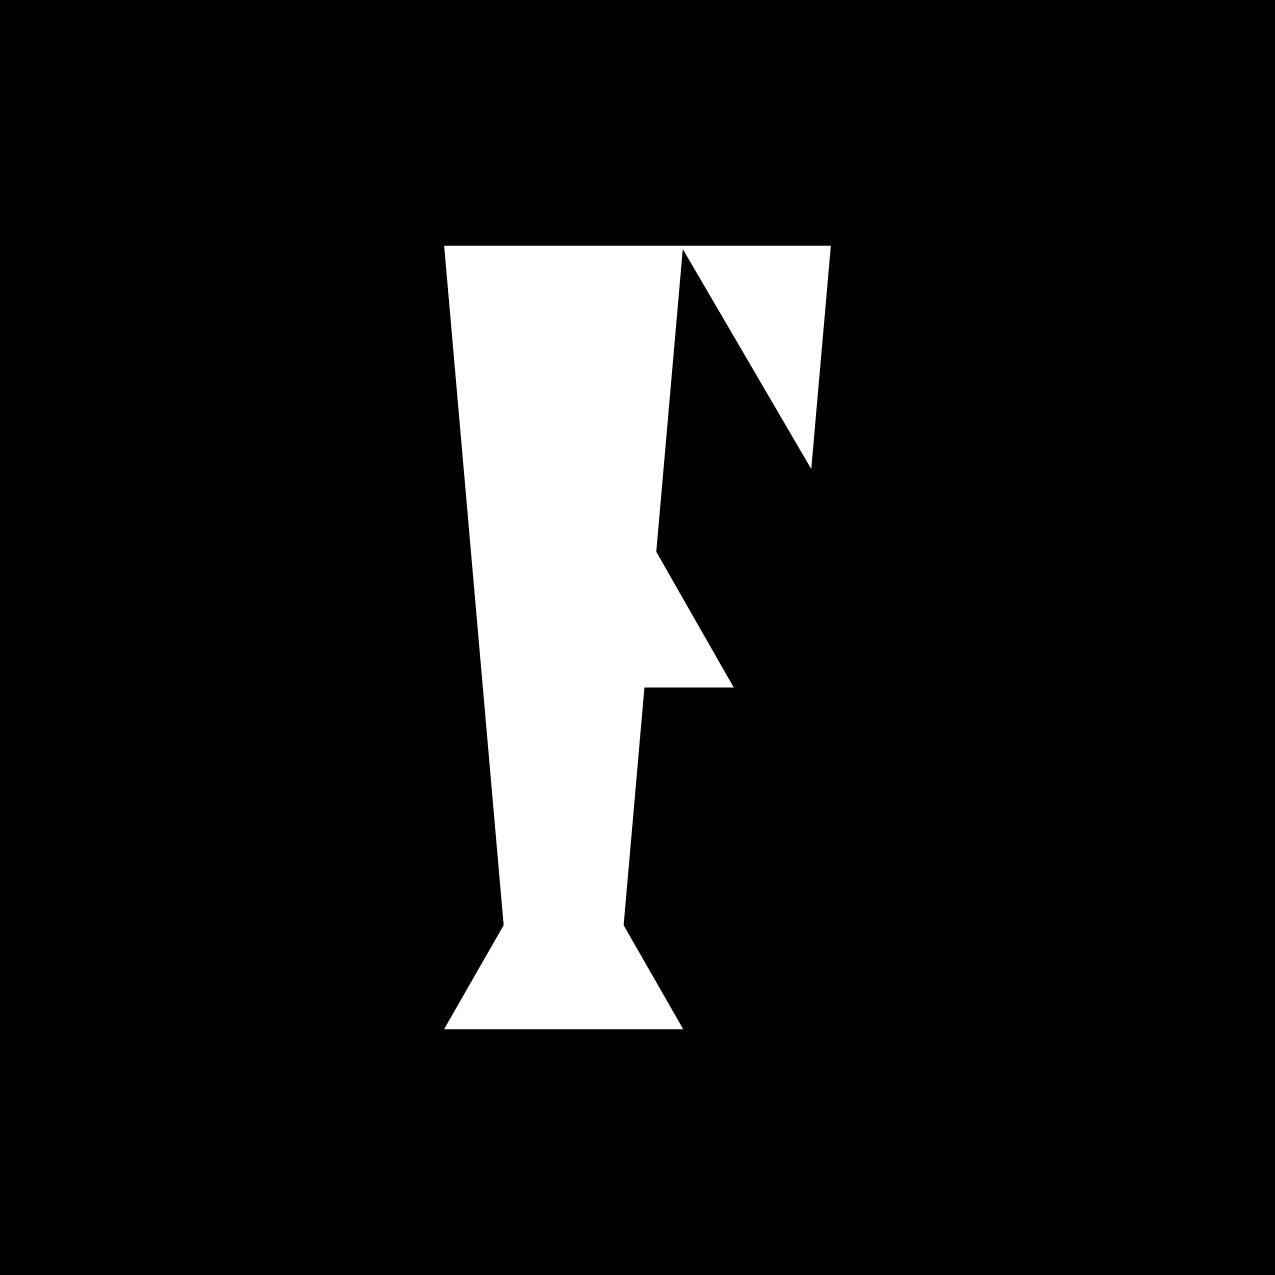 Letter F1 design by Furia